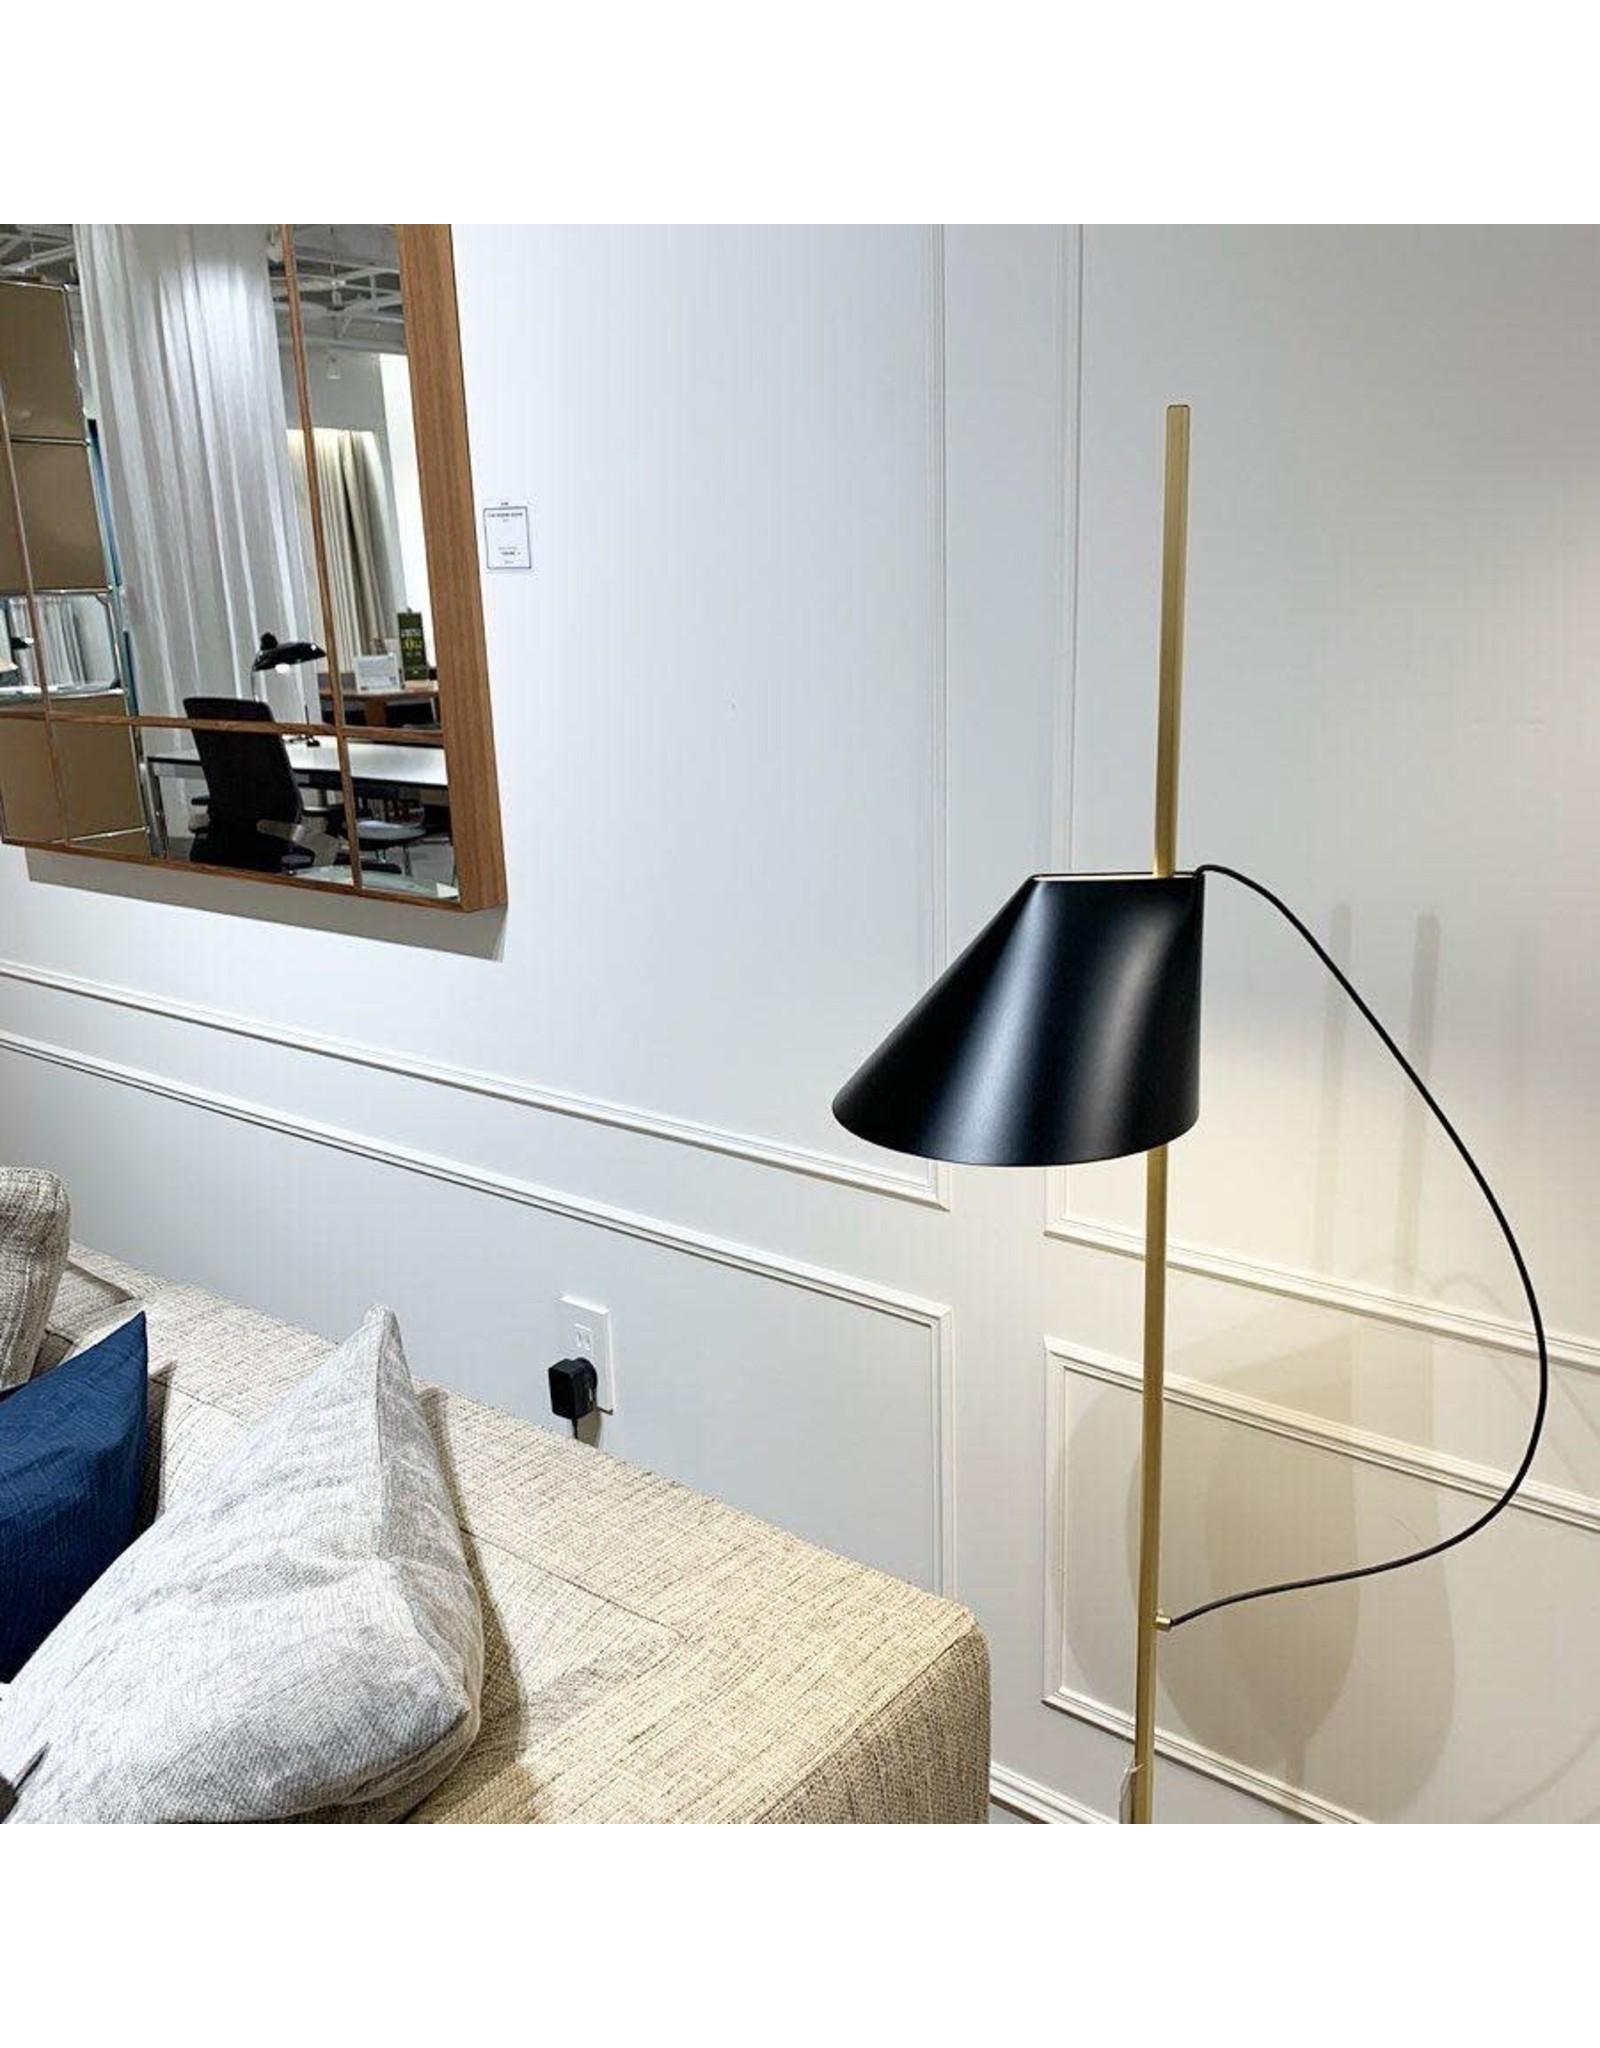 LOUIS POULSEN YUH LED FLOOR LAMP IN BRASS